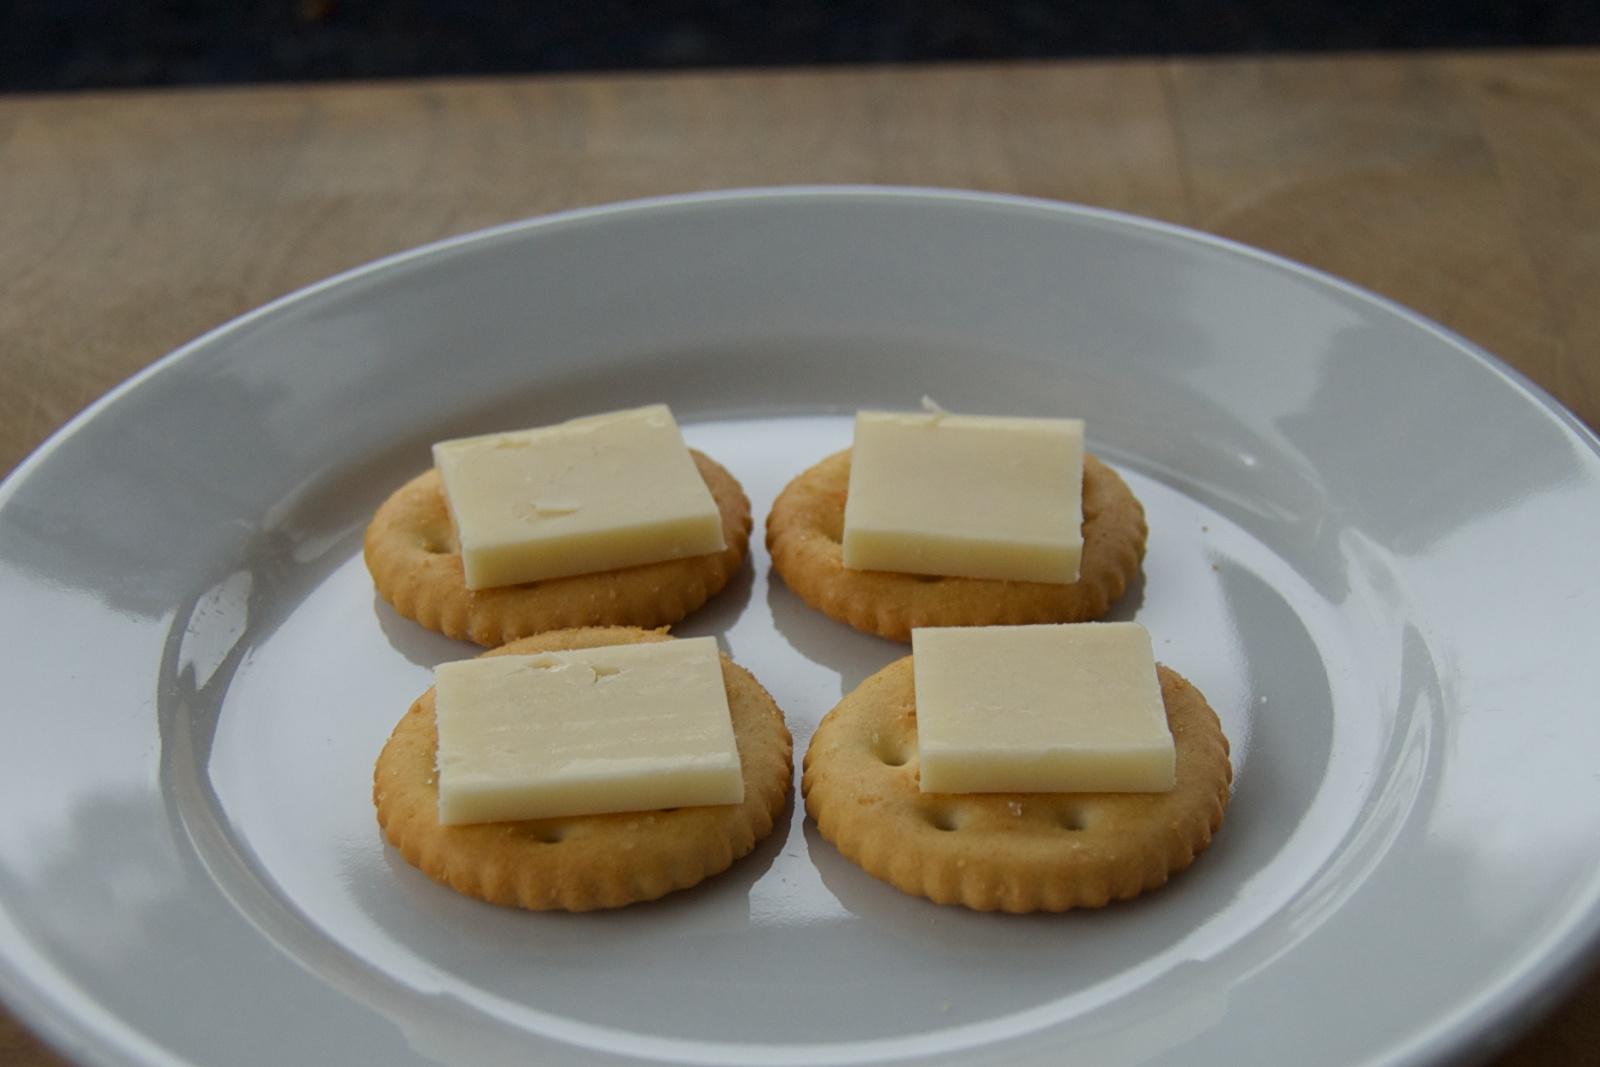 http://blog.rickk.com/food/2013/12/15/ate.2013.12.15.s.jpg